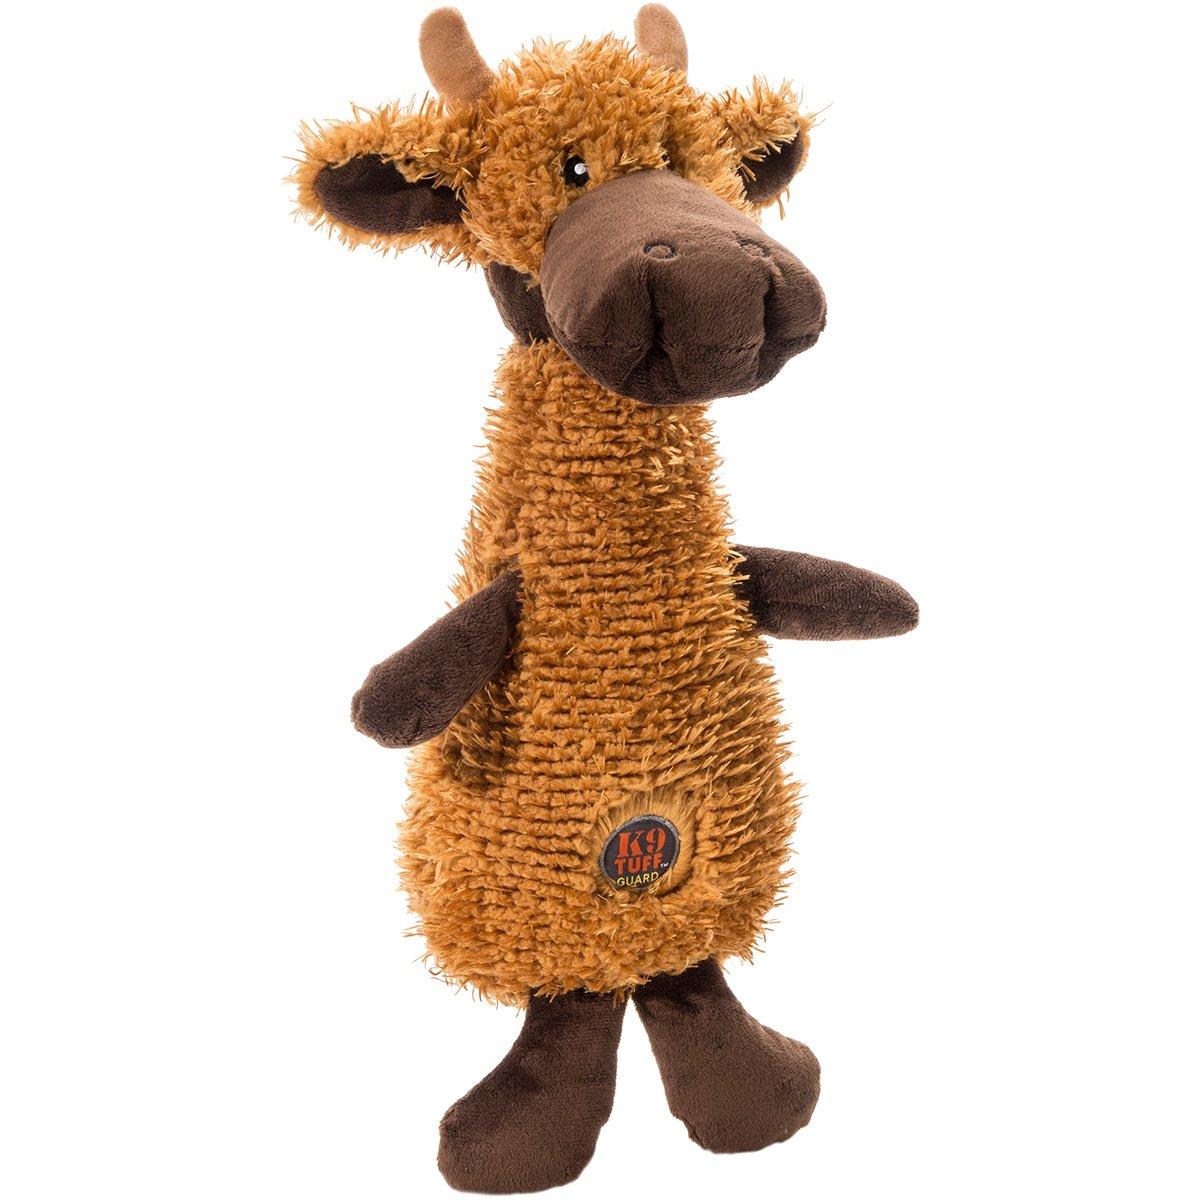 Charming Pet Scruffles Moose Dog Toy, Small